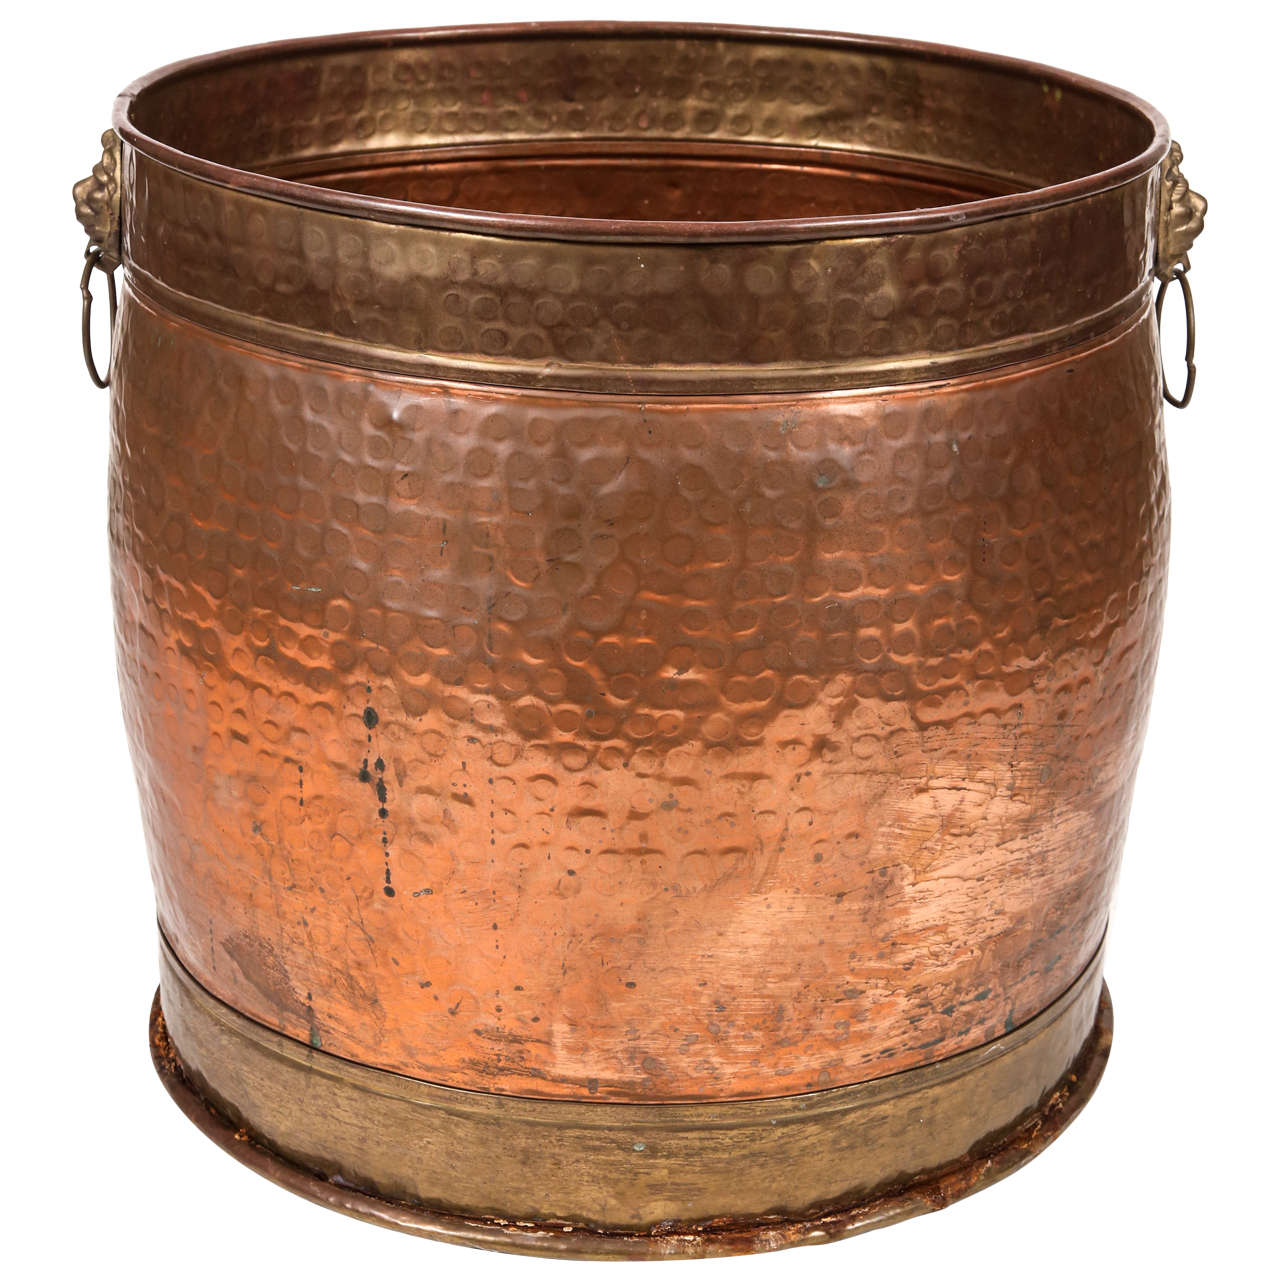 Hammered Copper Pot 1